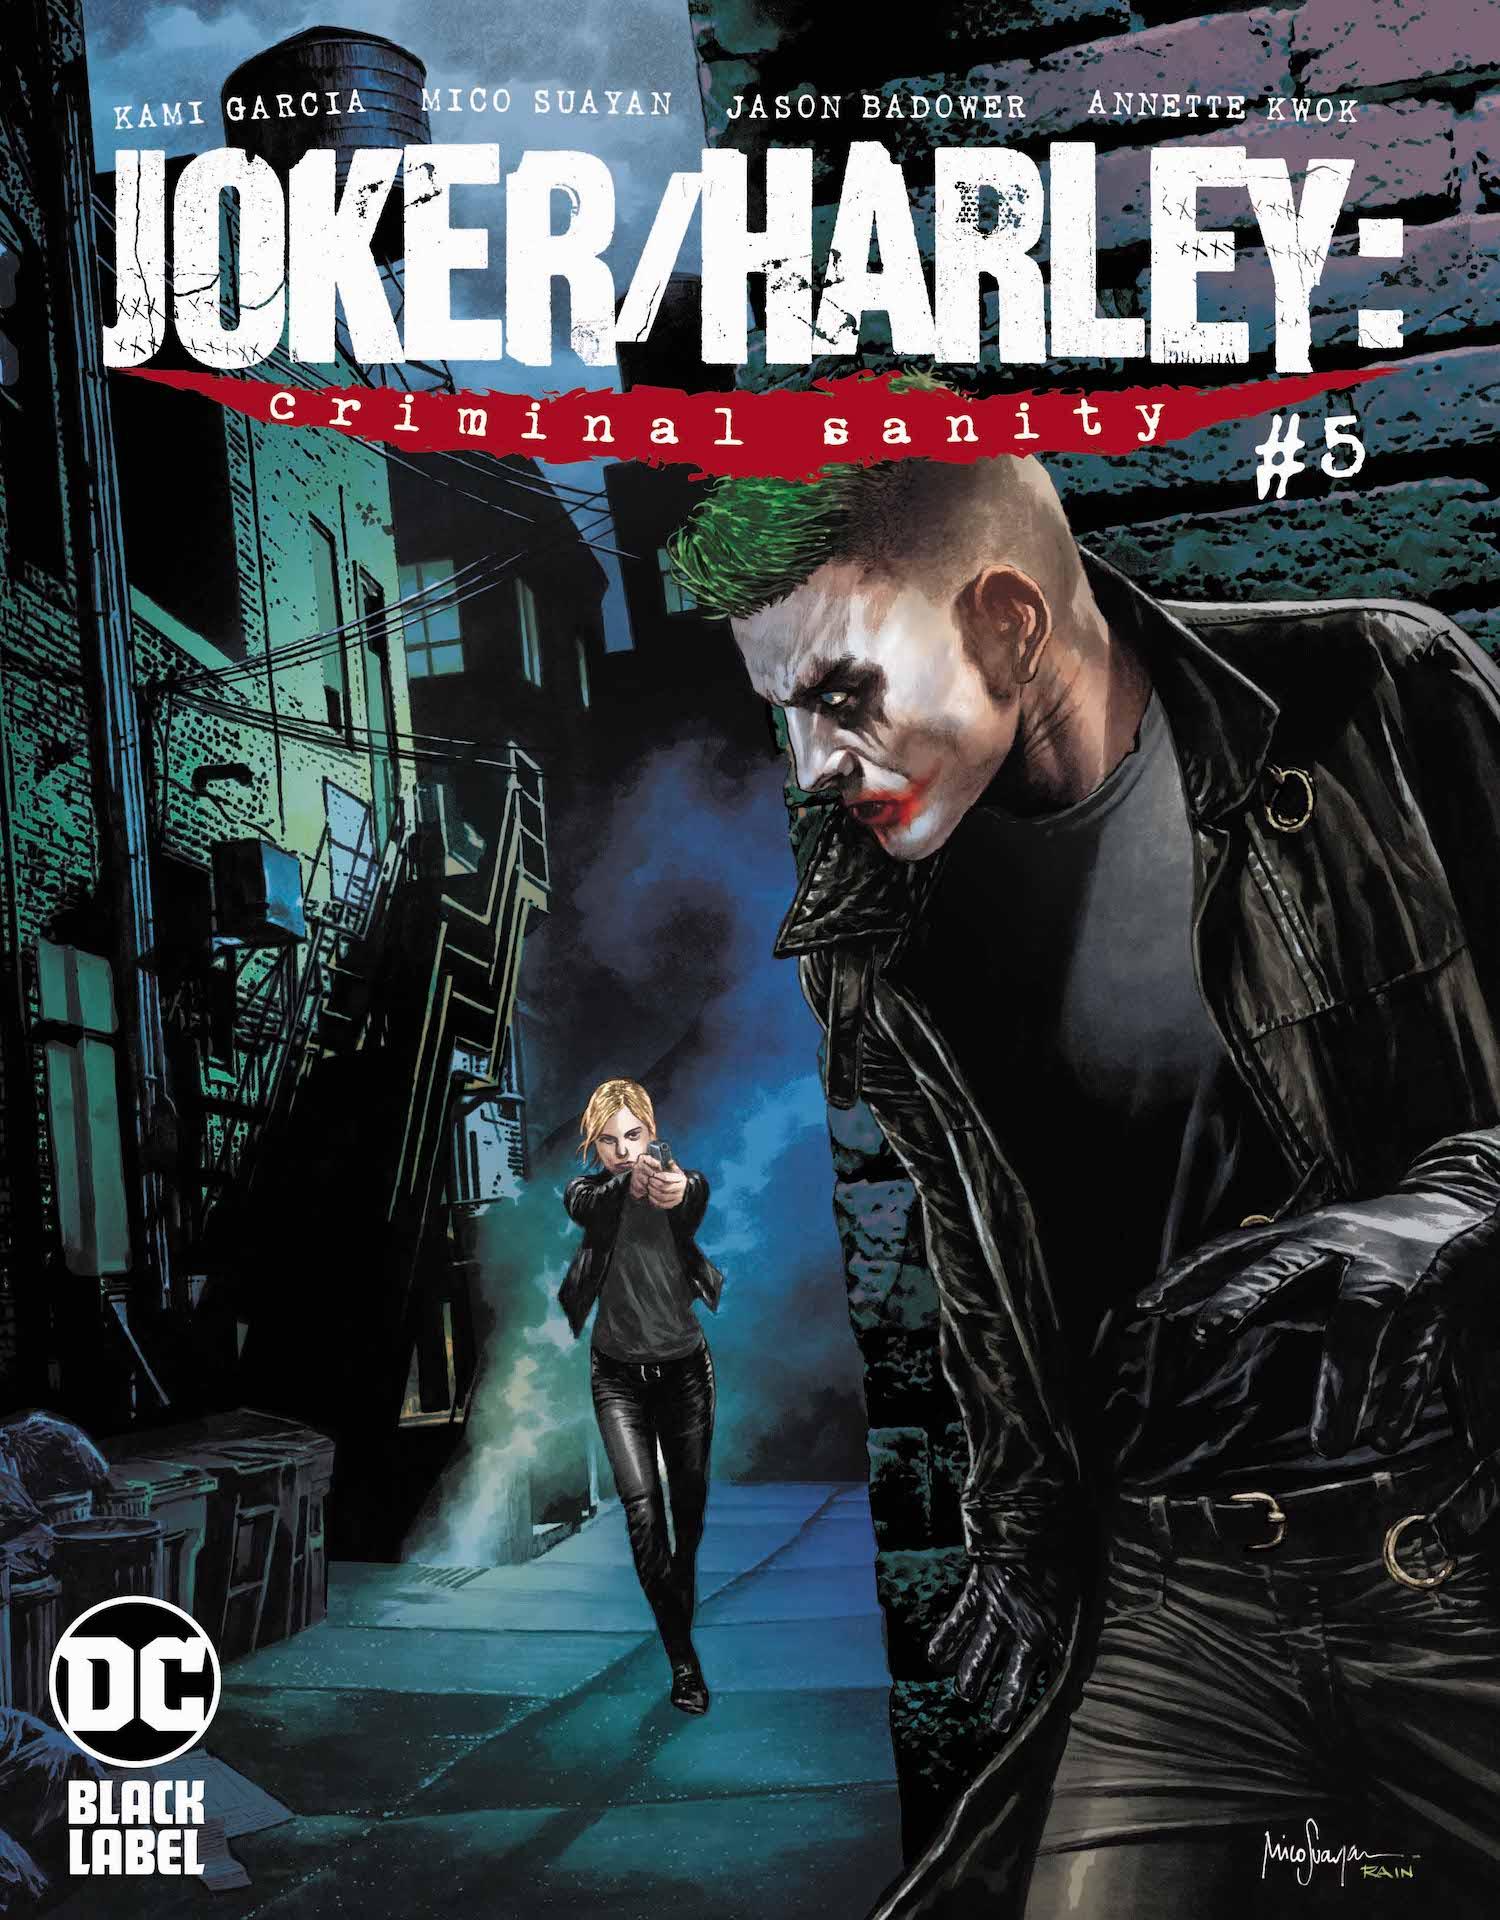 joker-harley-criminal-sanity_52